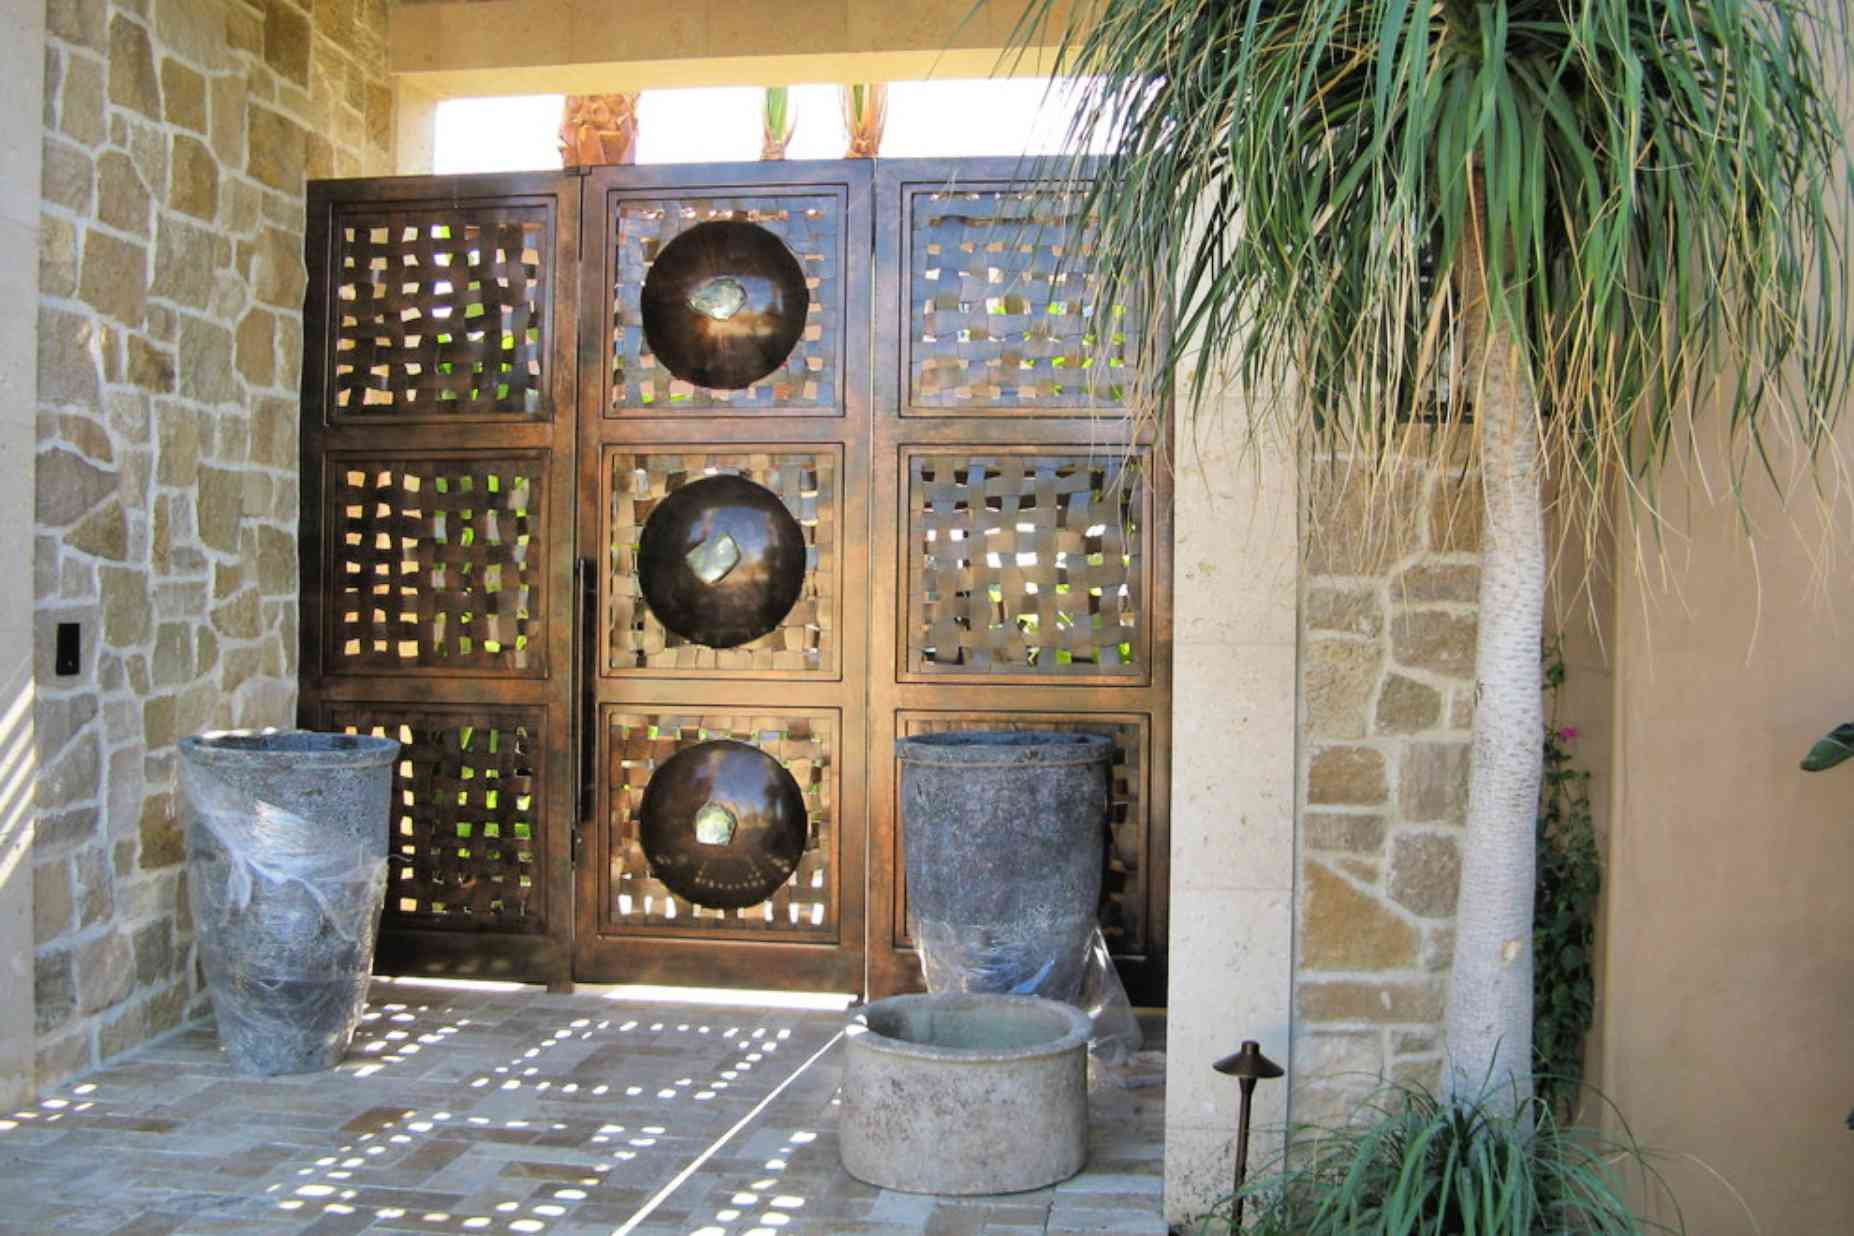 diseño de puerta mediterránea